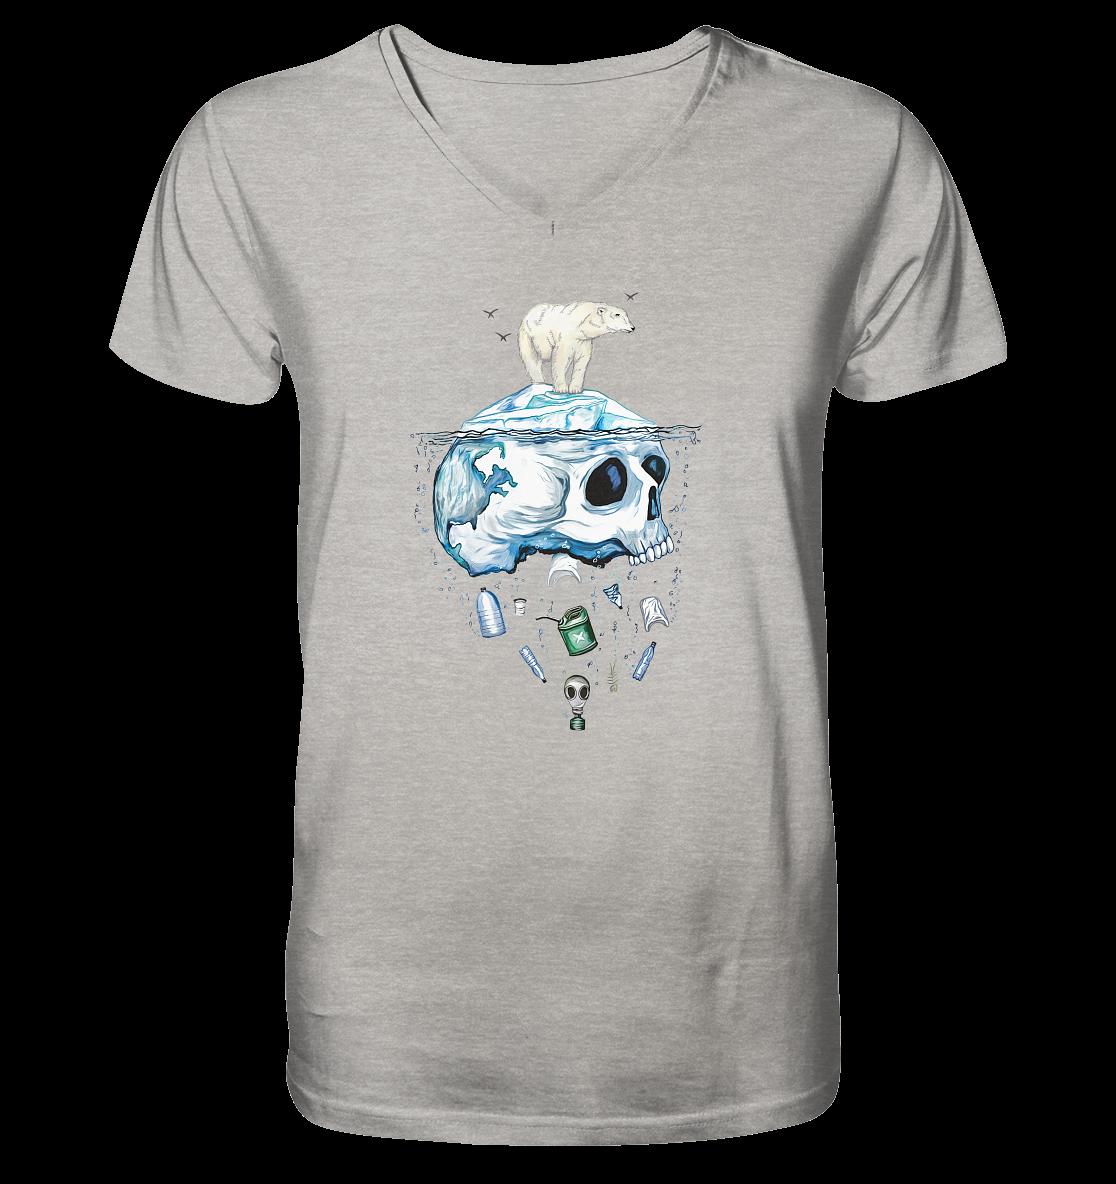 front-mens-organic-v-neck-shirt-c2c1c0-1116x.png